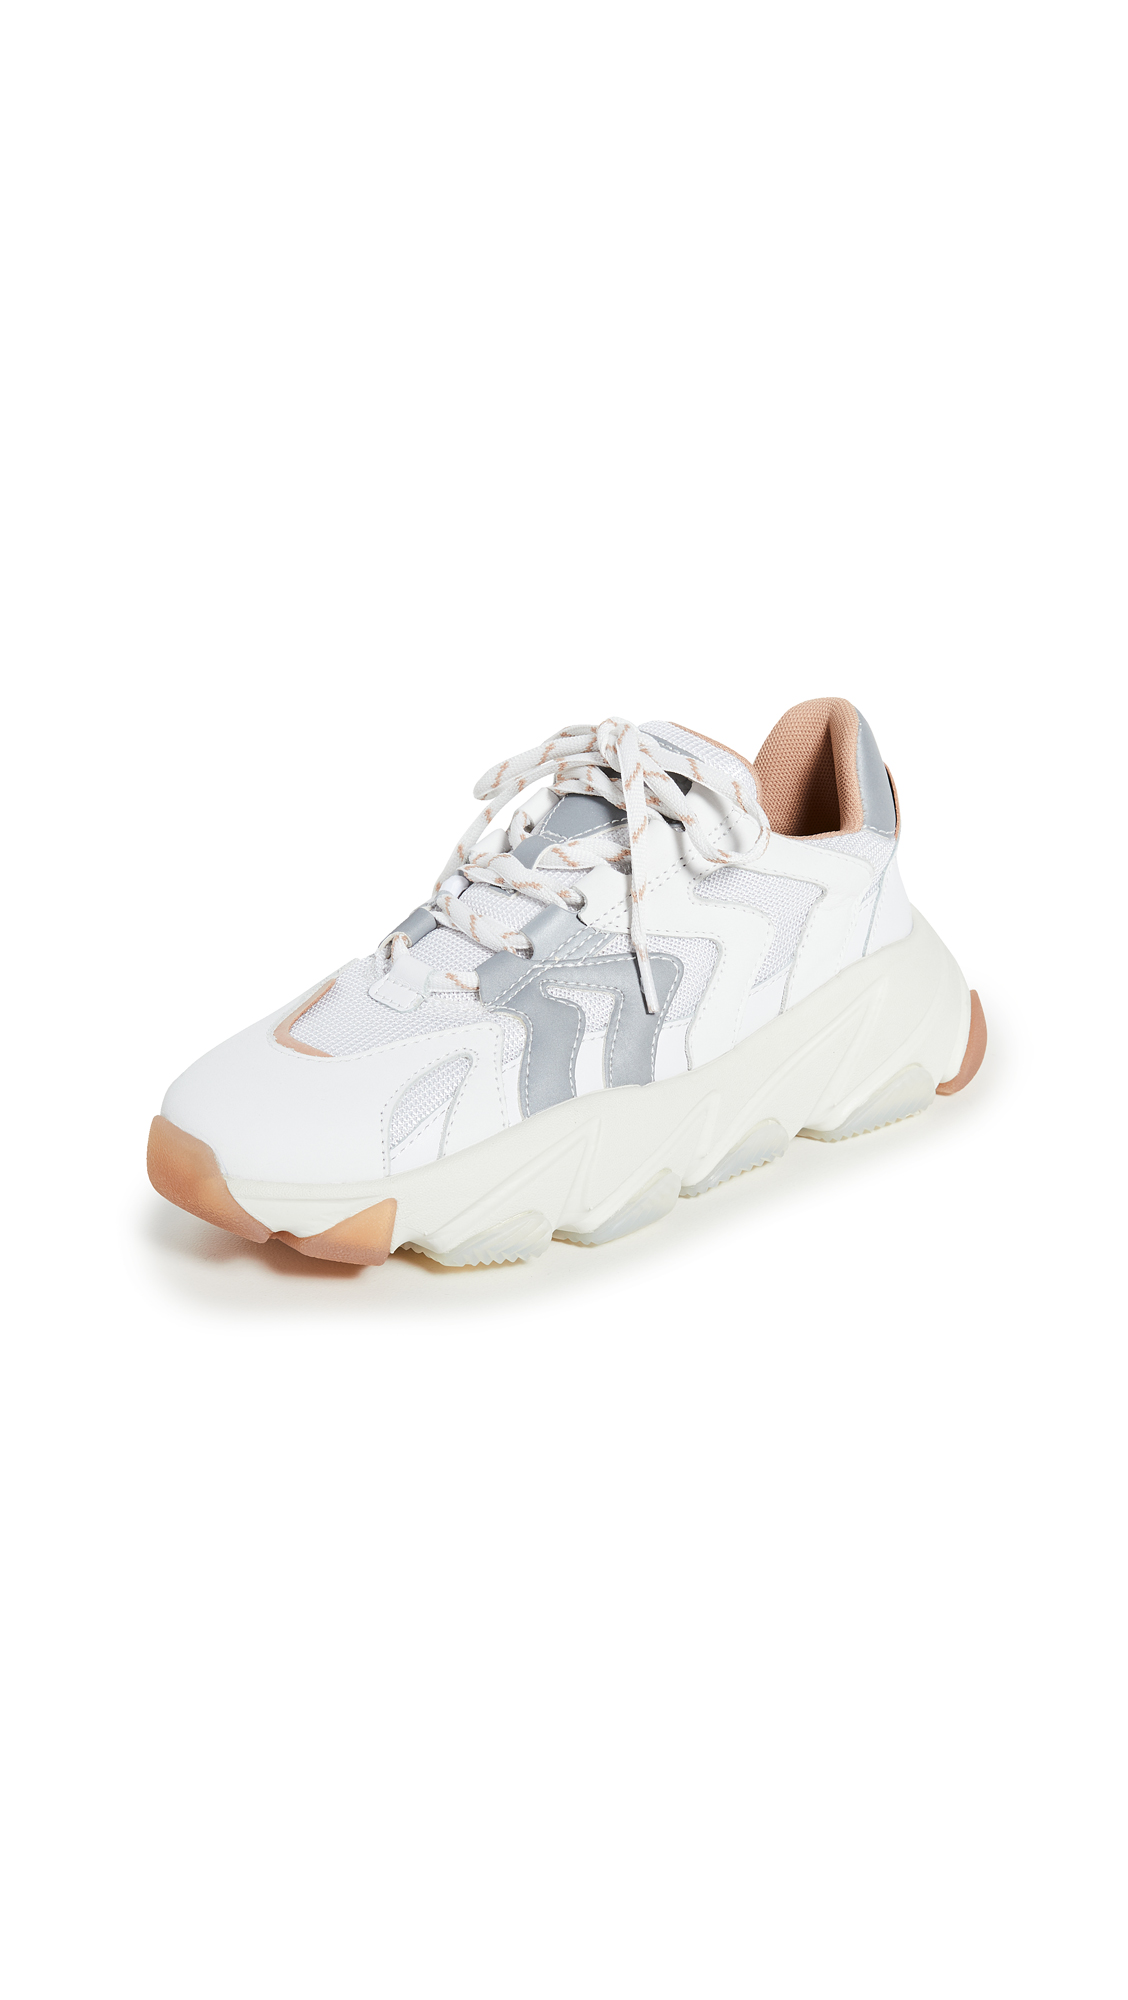 Buy Ash Extreme Sneakers online, shop Ash